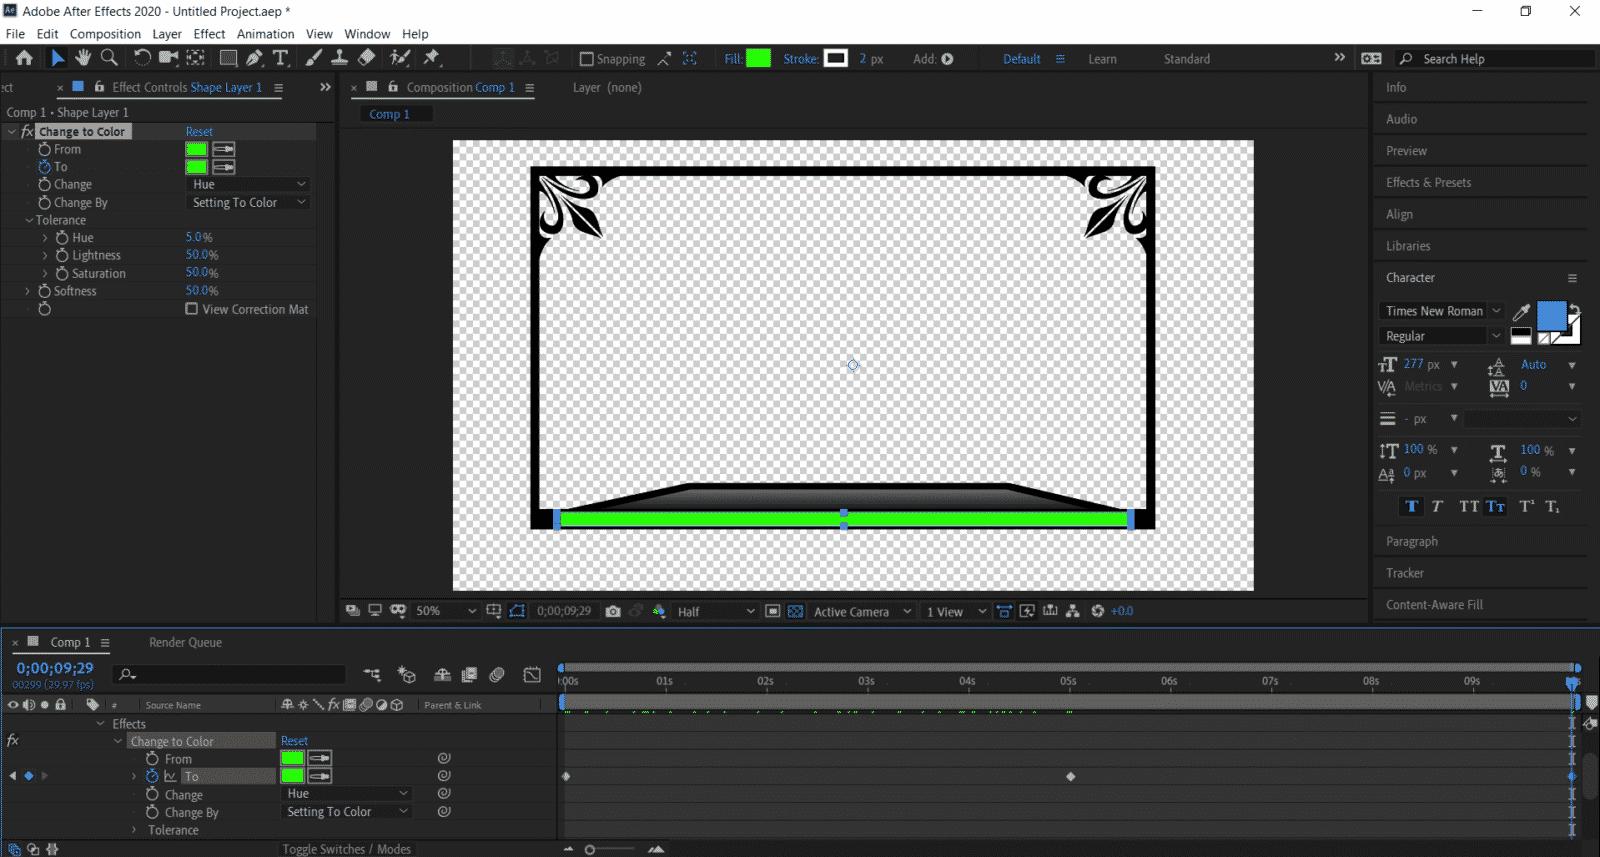 animated overlay comp 1 shape layer 1 time adjustment